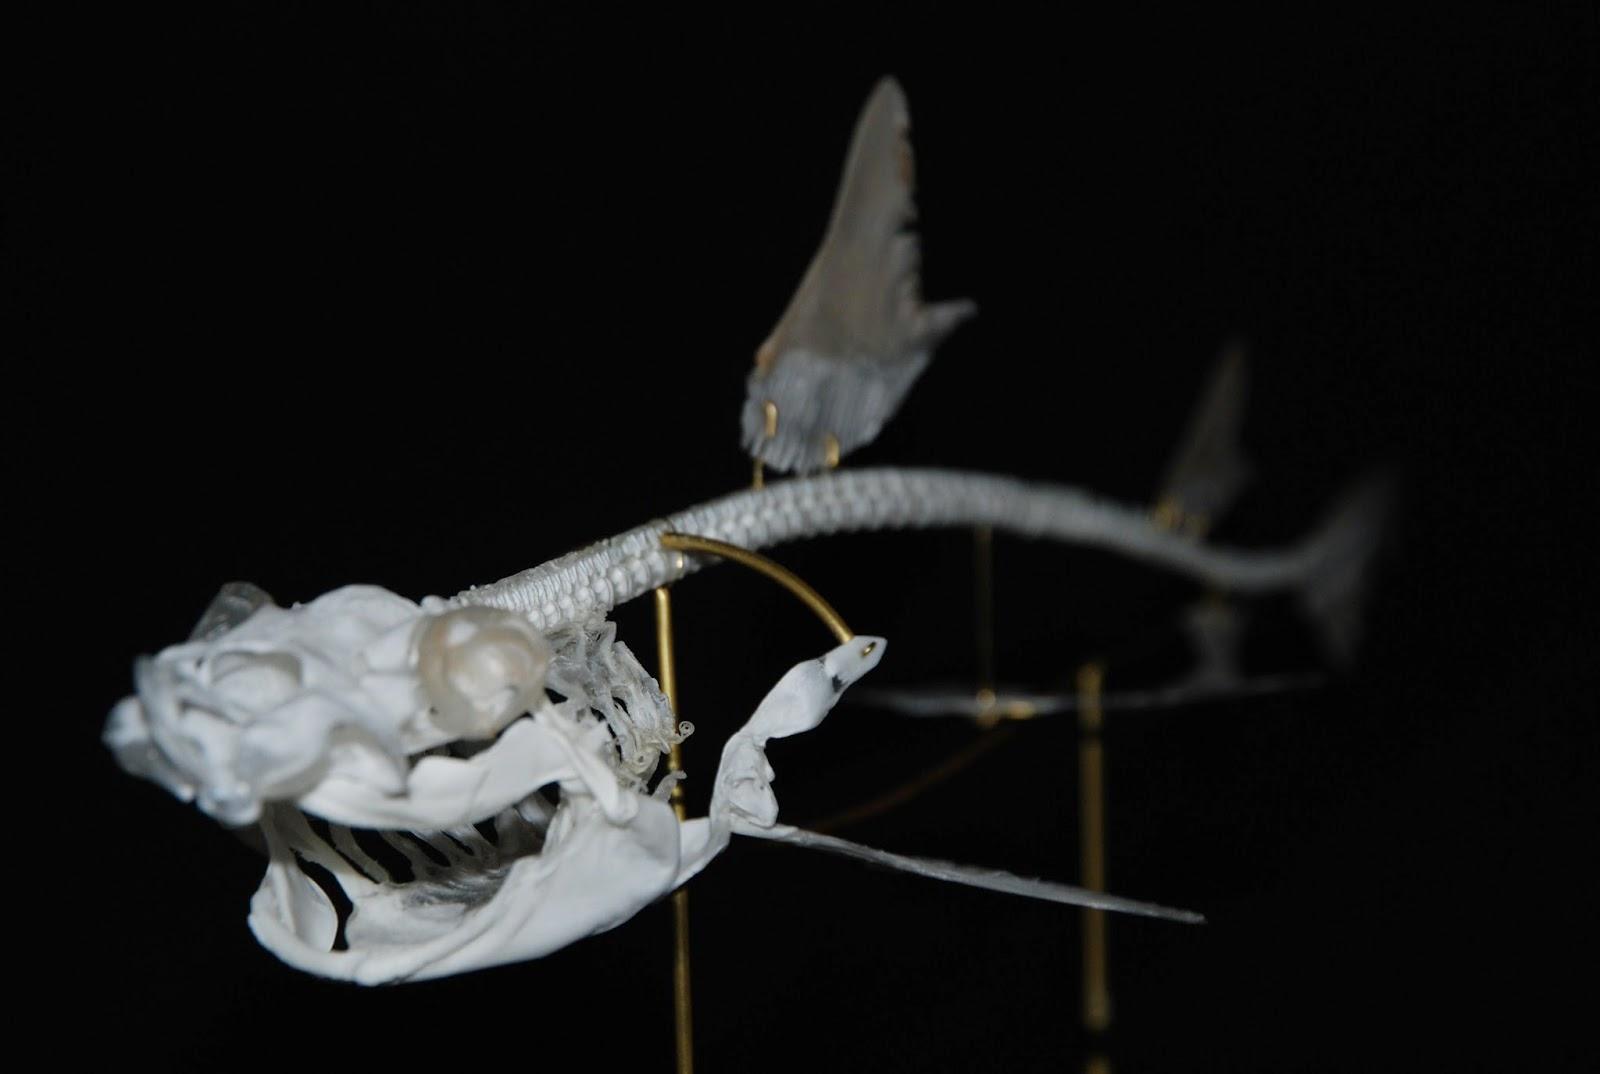 Shark Skeleton Diagram Mk4 Jetta Tdi Wiring The Gallery For Gt Great White